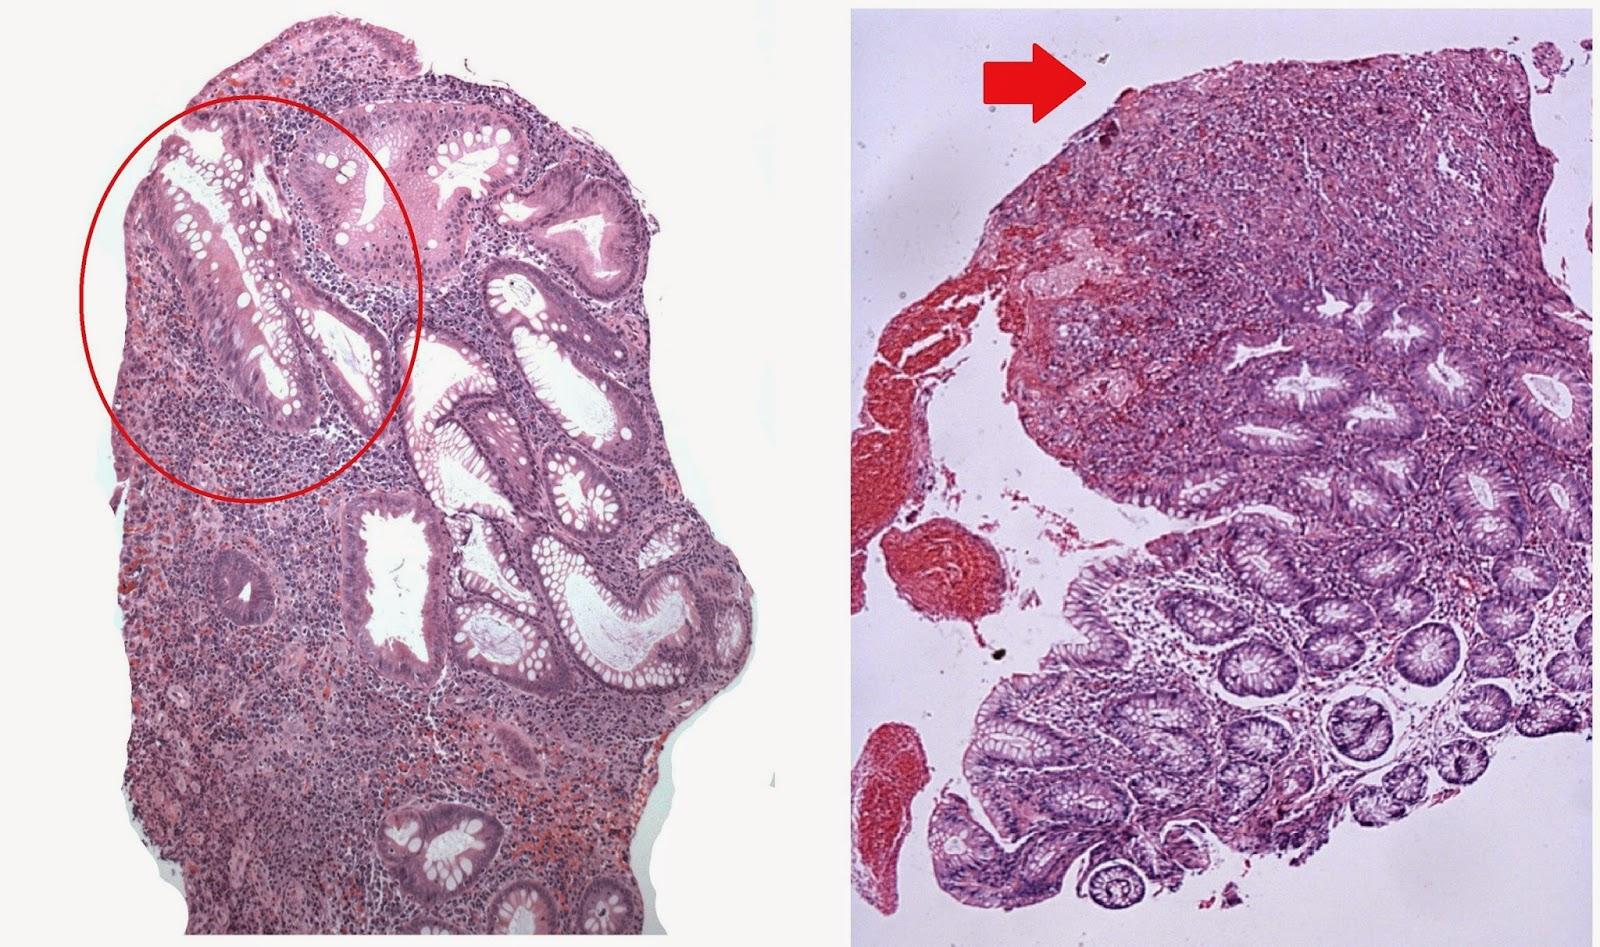 Inflammatory Granulation Tissue Polyp Stomach